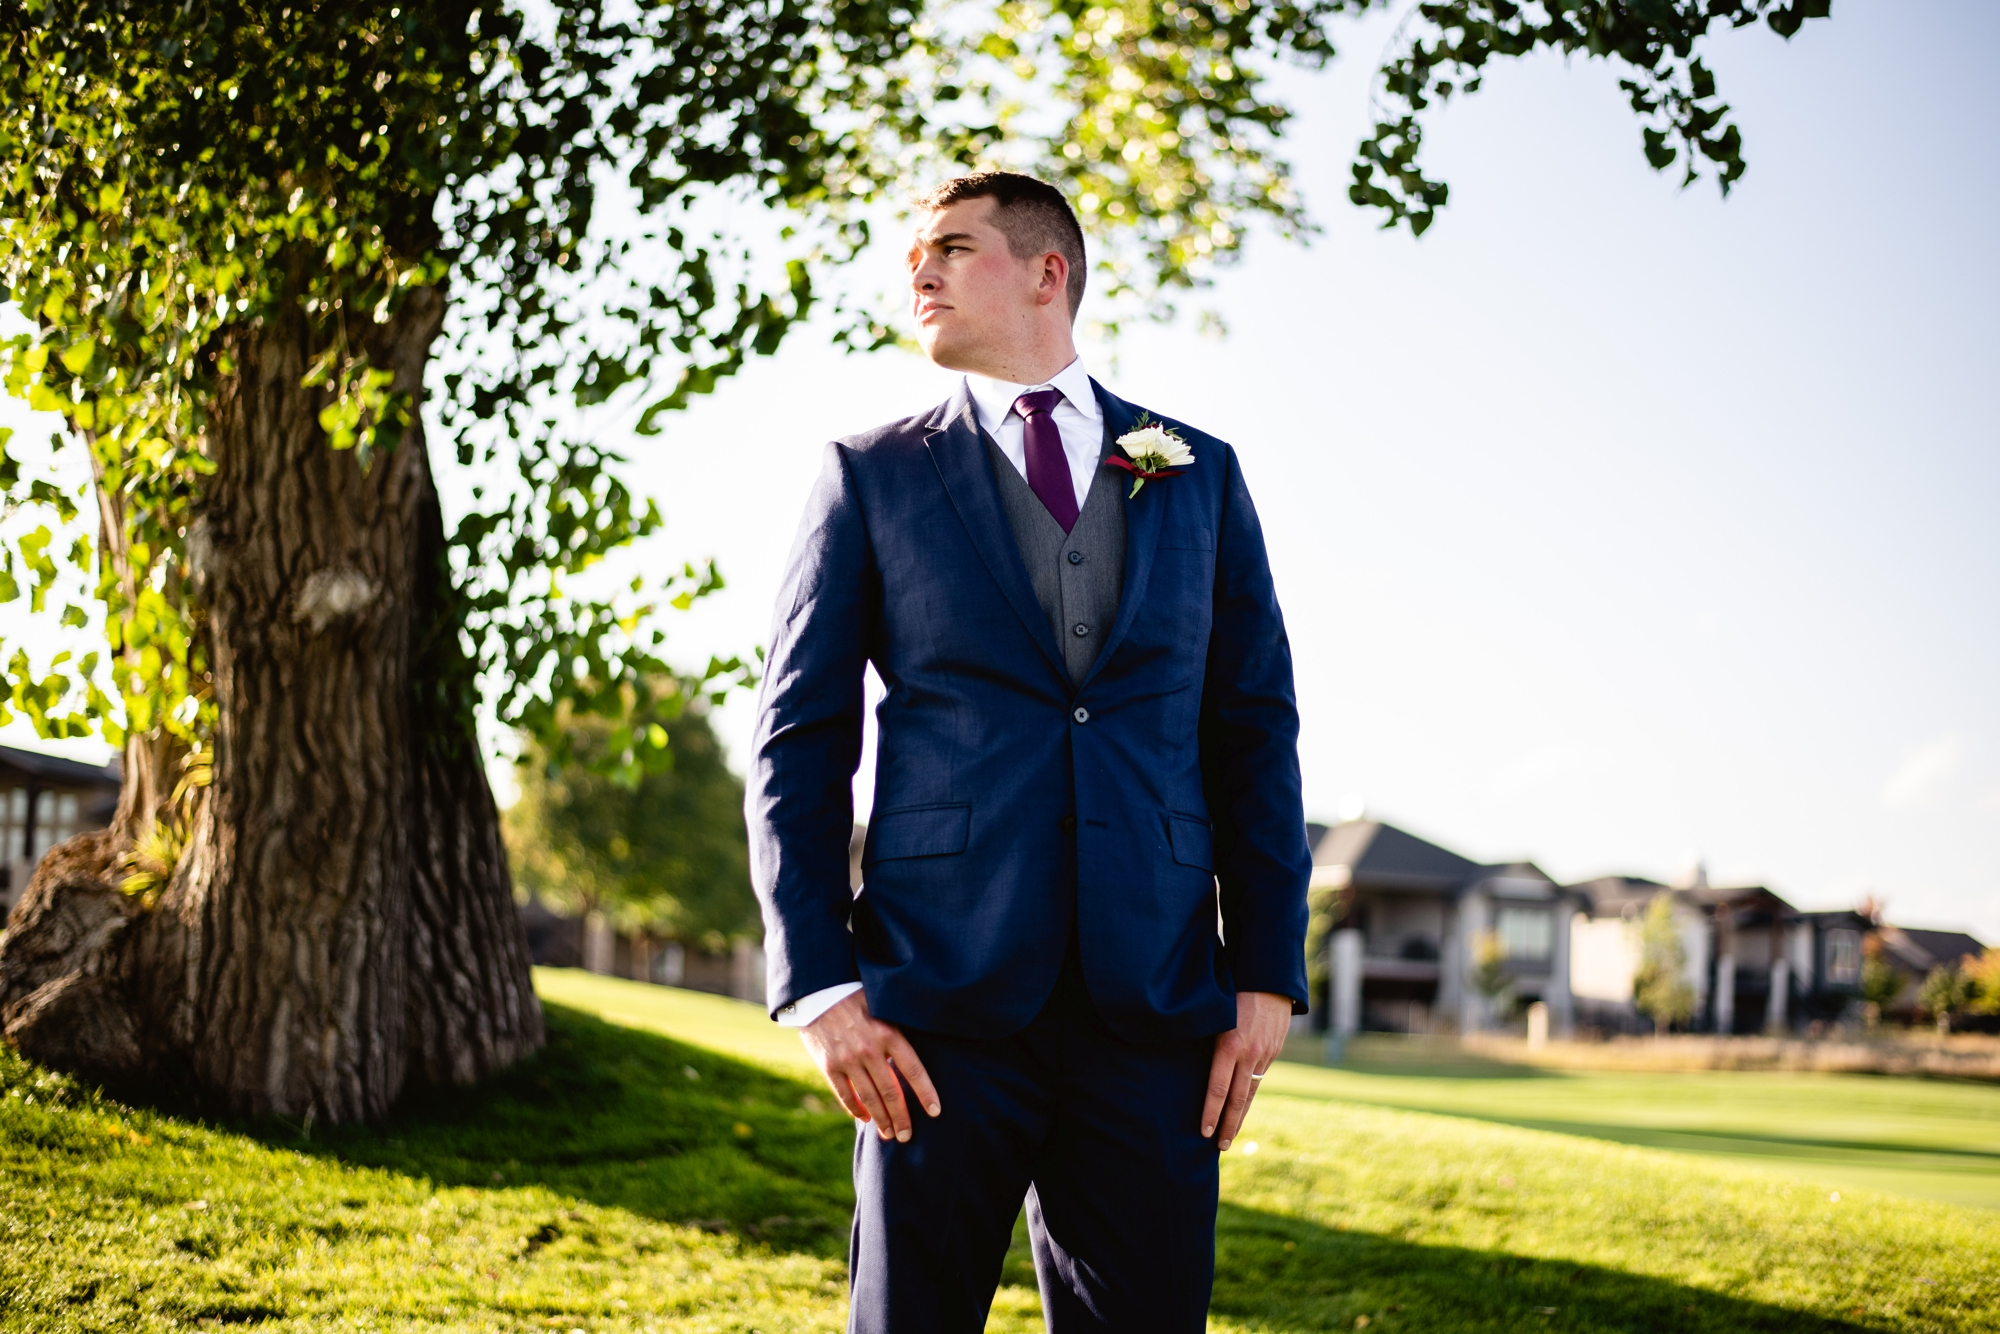 Windsor Big Red Barn Wedding in 2020 | Denver wedding ...